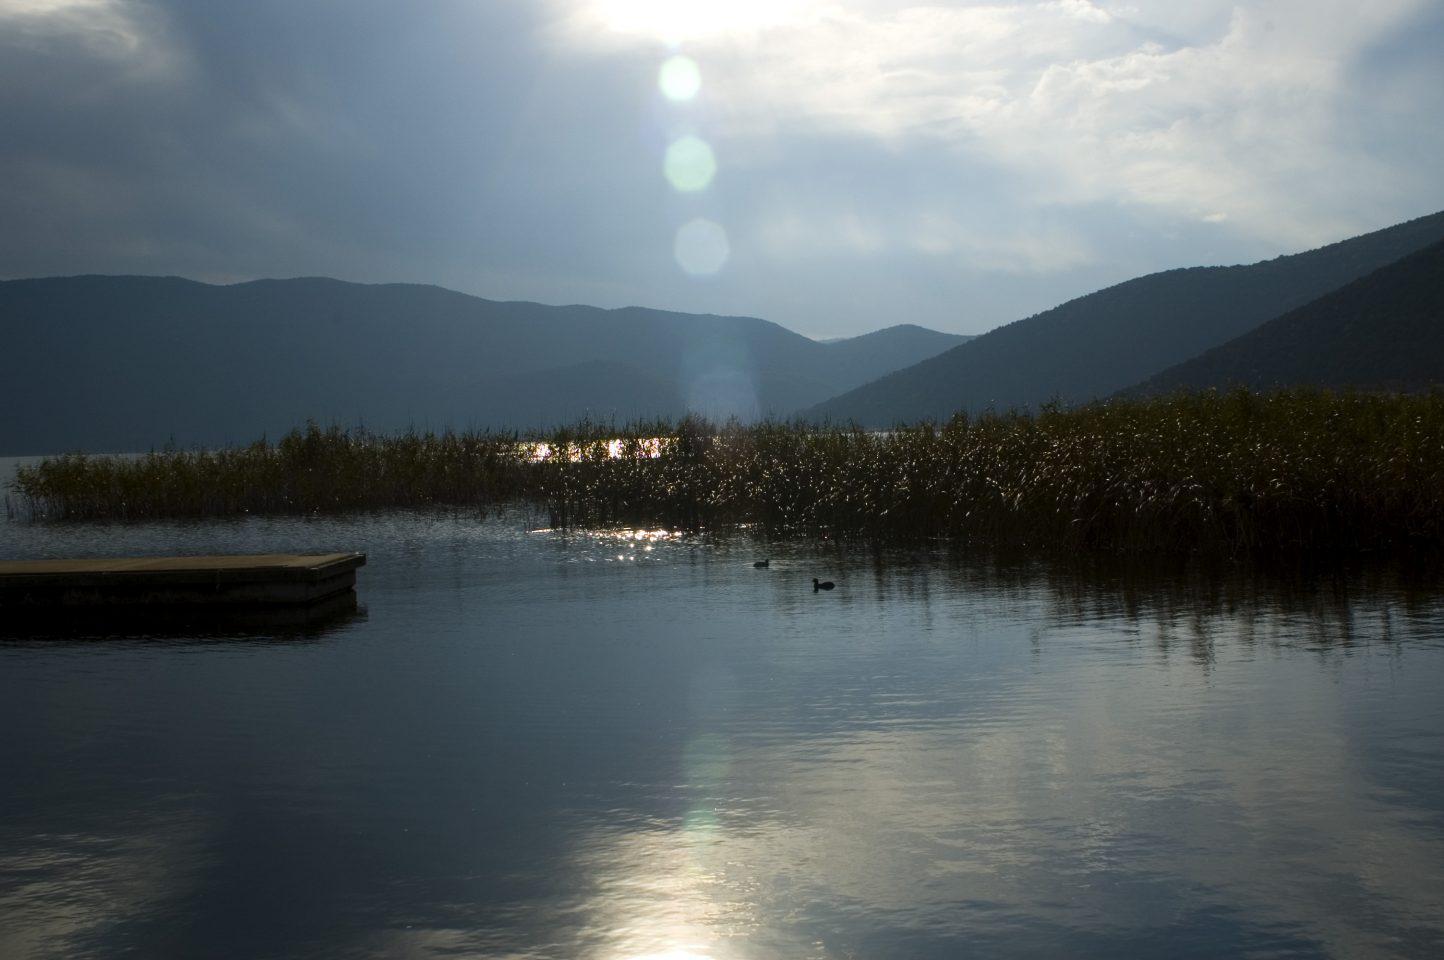 mikri-prespa Η Ελλάδα και οι υδροβιότοποί της (μέρος α')